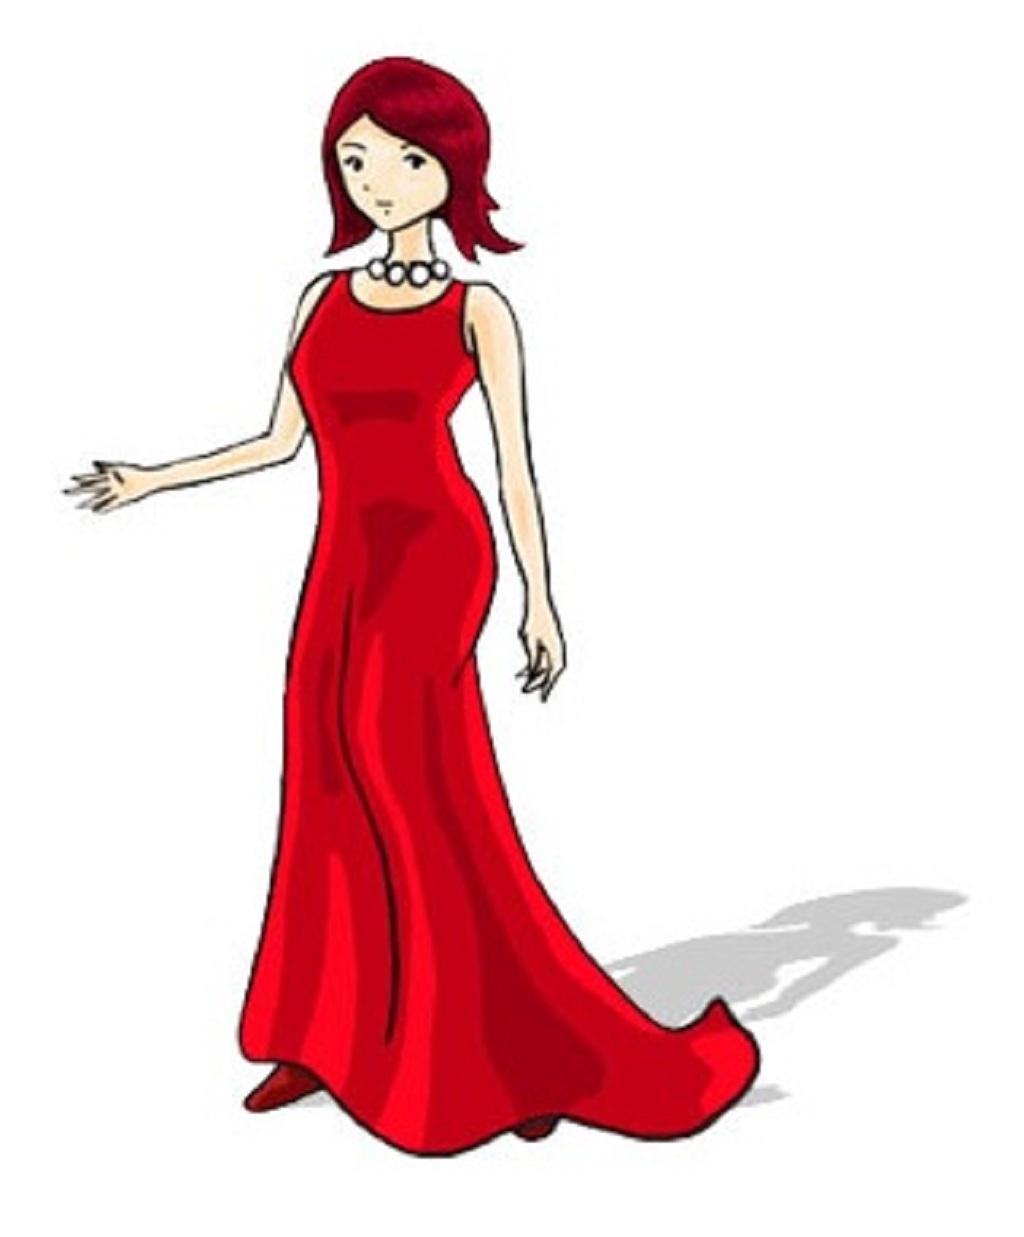 Women Clip Art Free Images At Clker Com Vector Clip Art Online